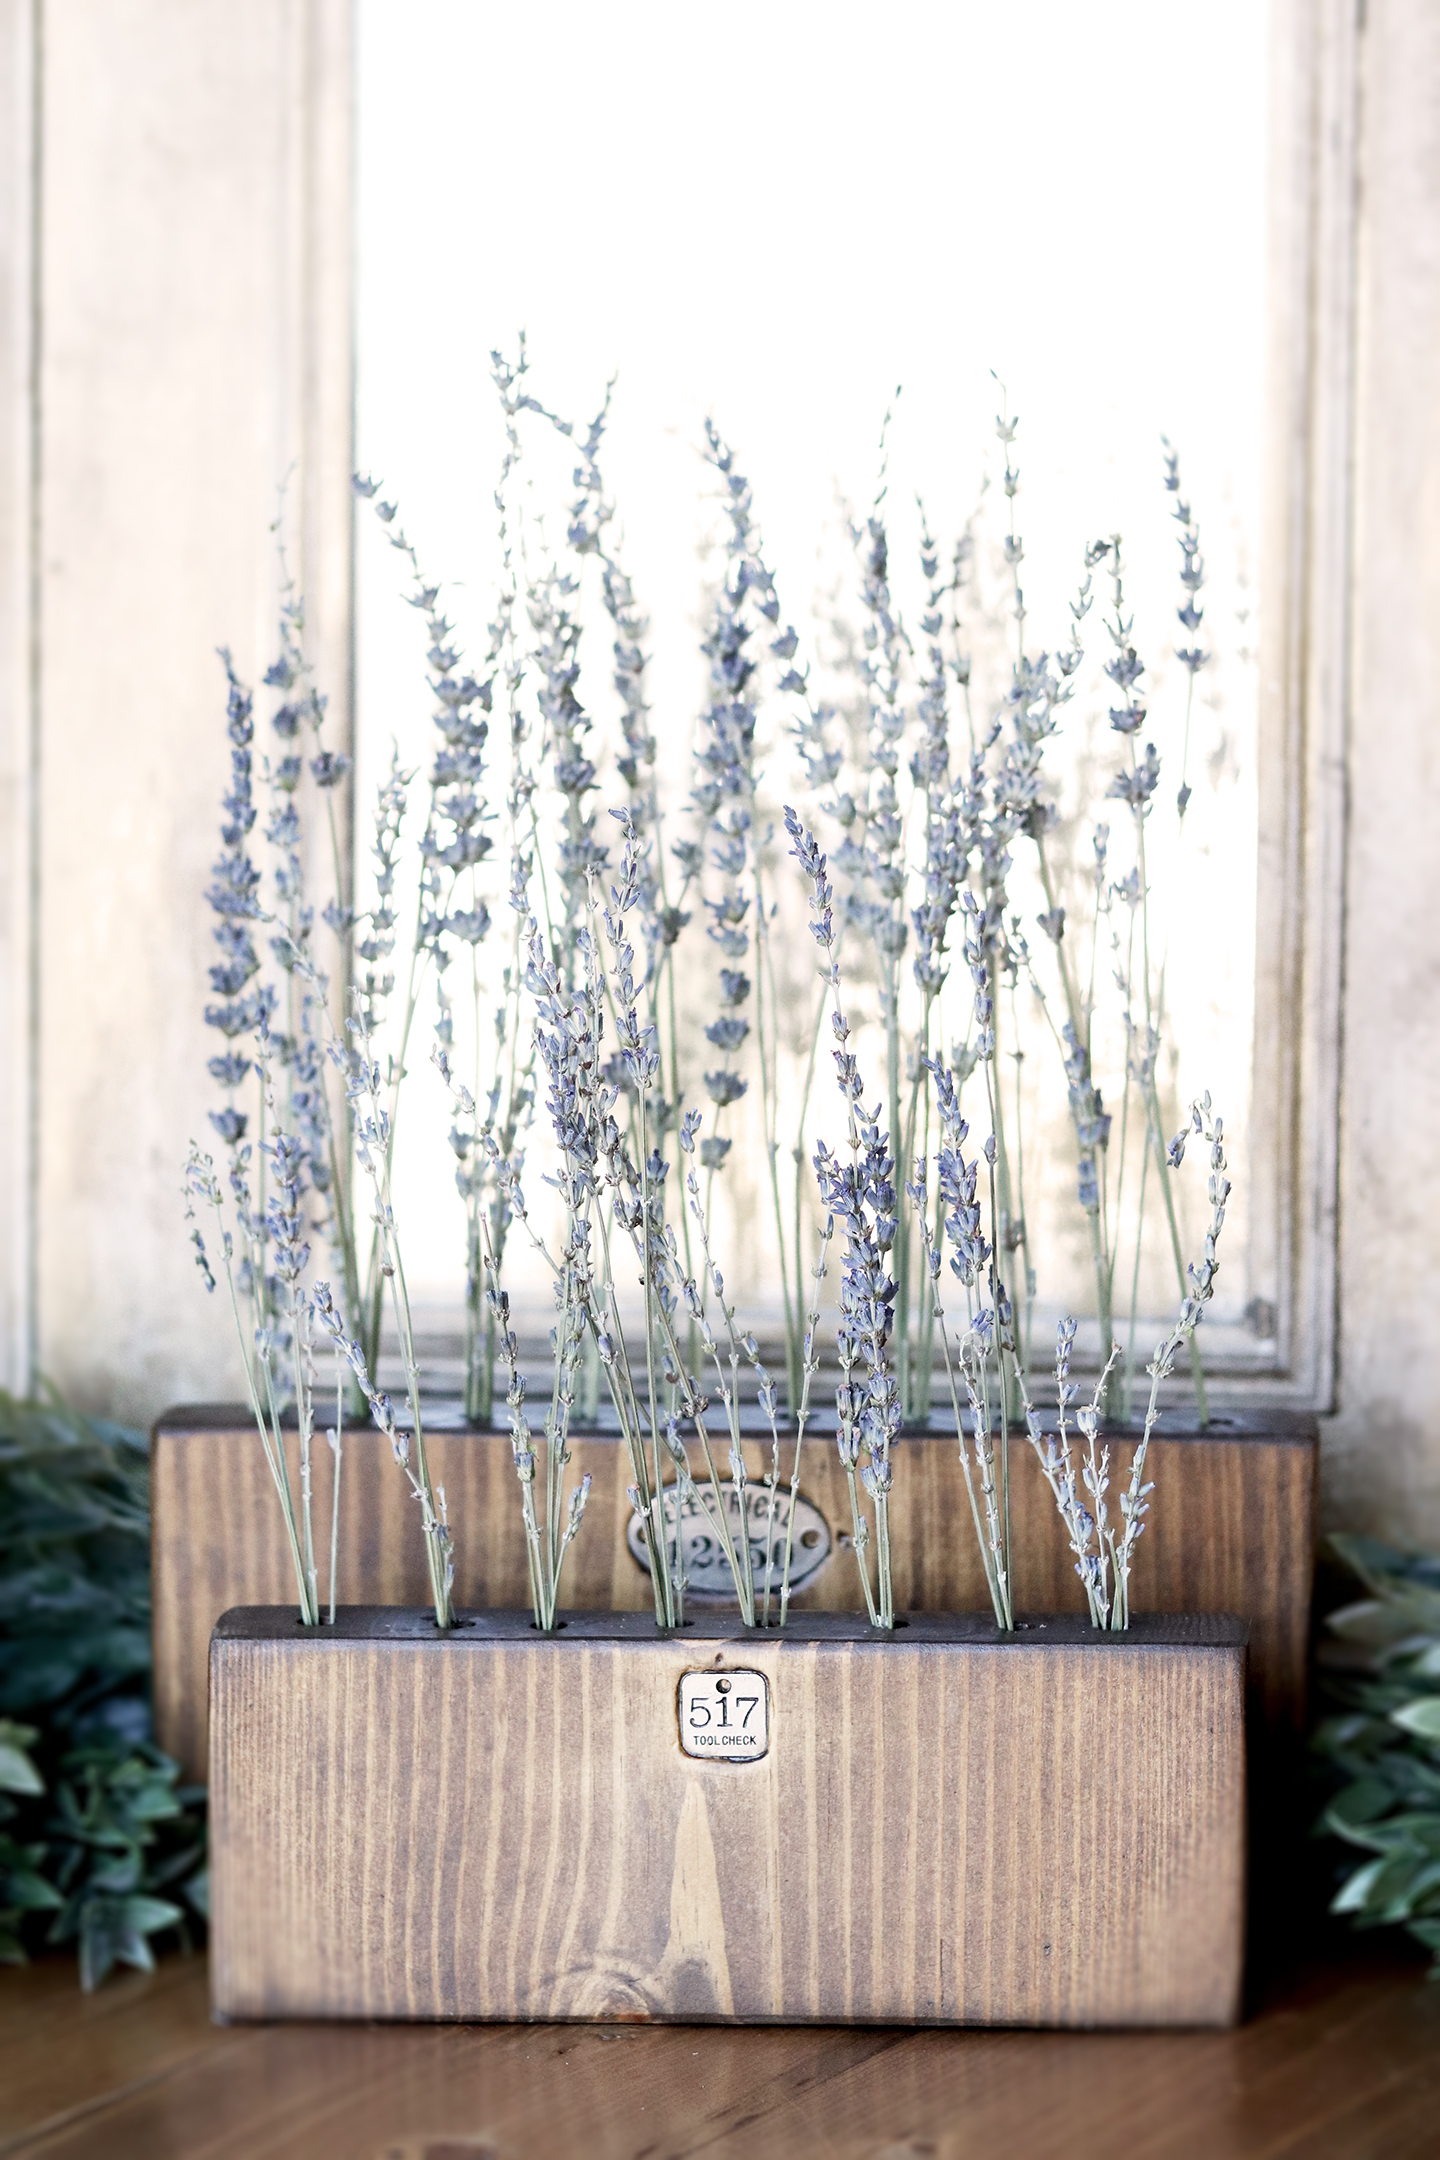 Boroughfare Home Vintage Lavender Set with Metal Number Decals Vertical